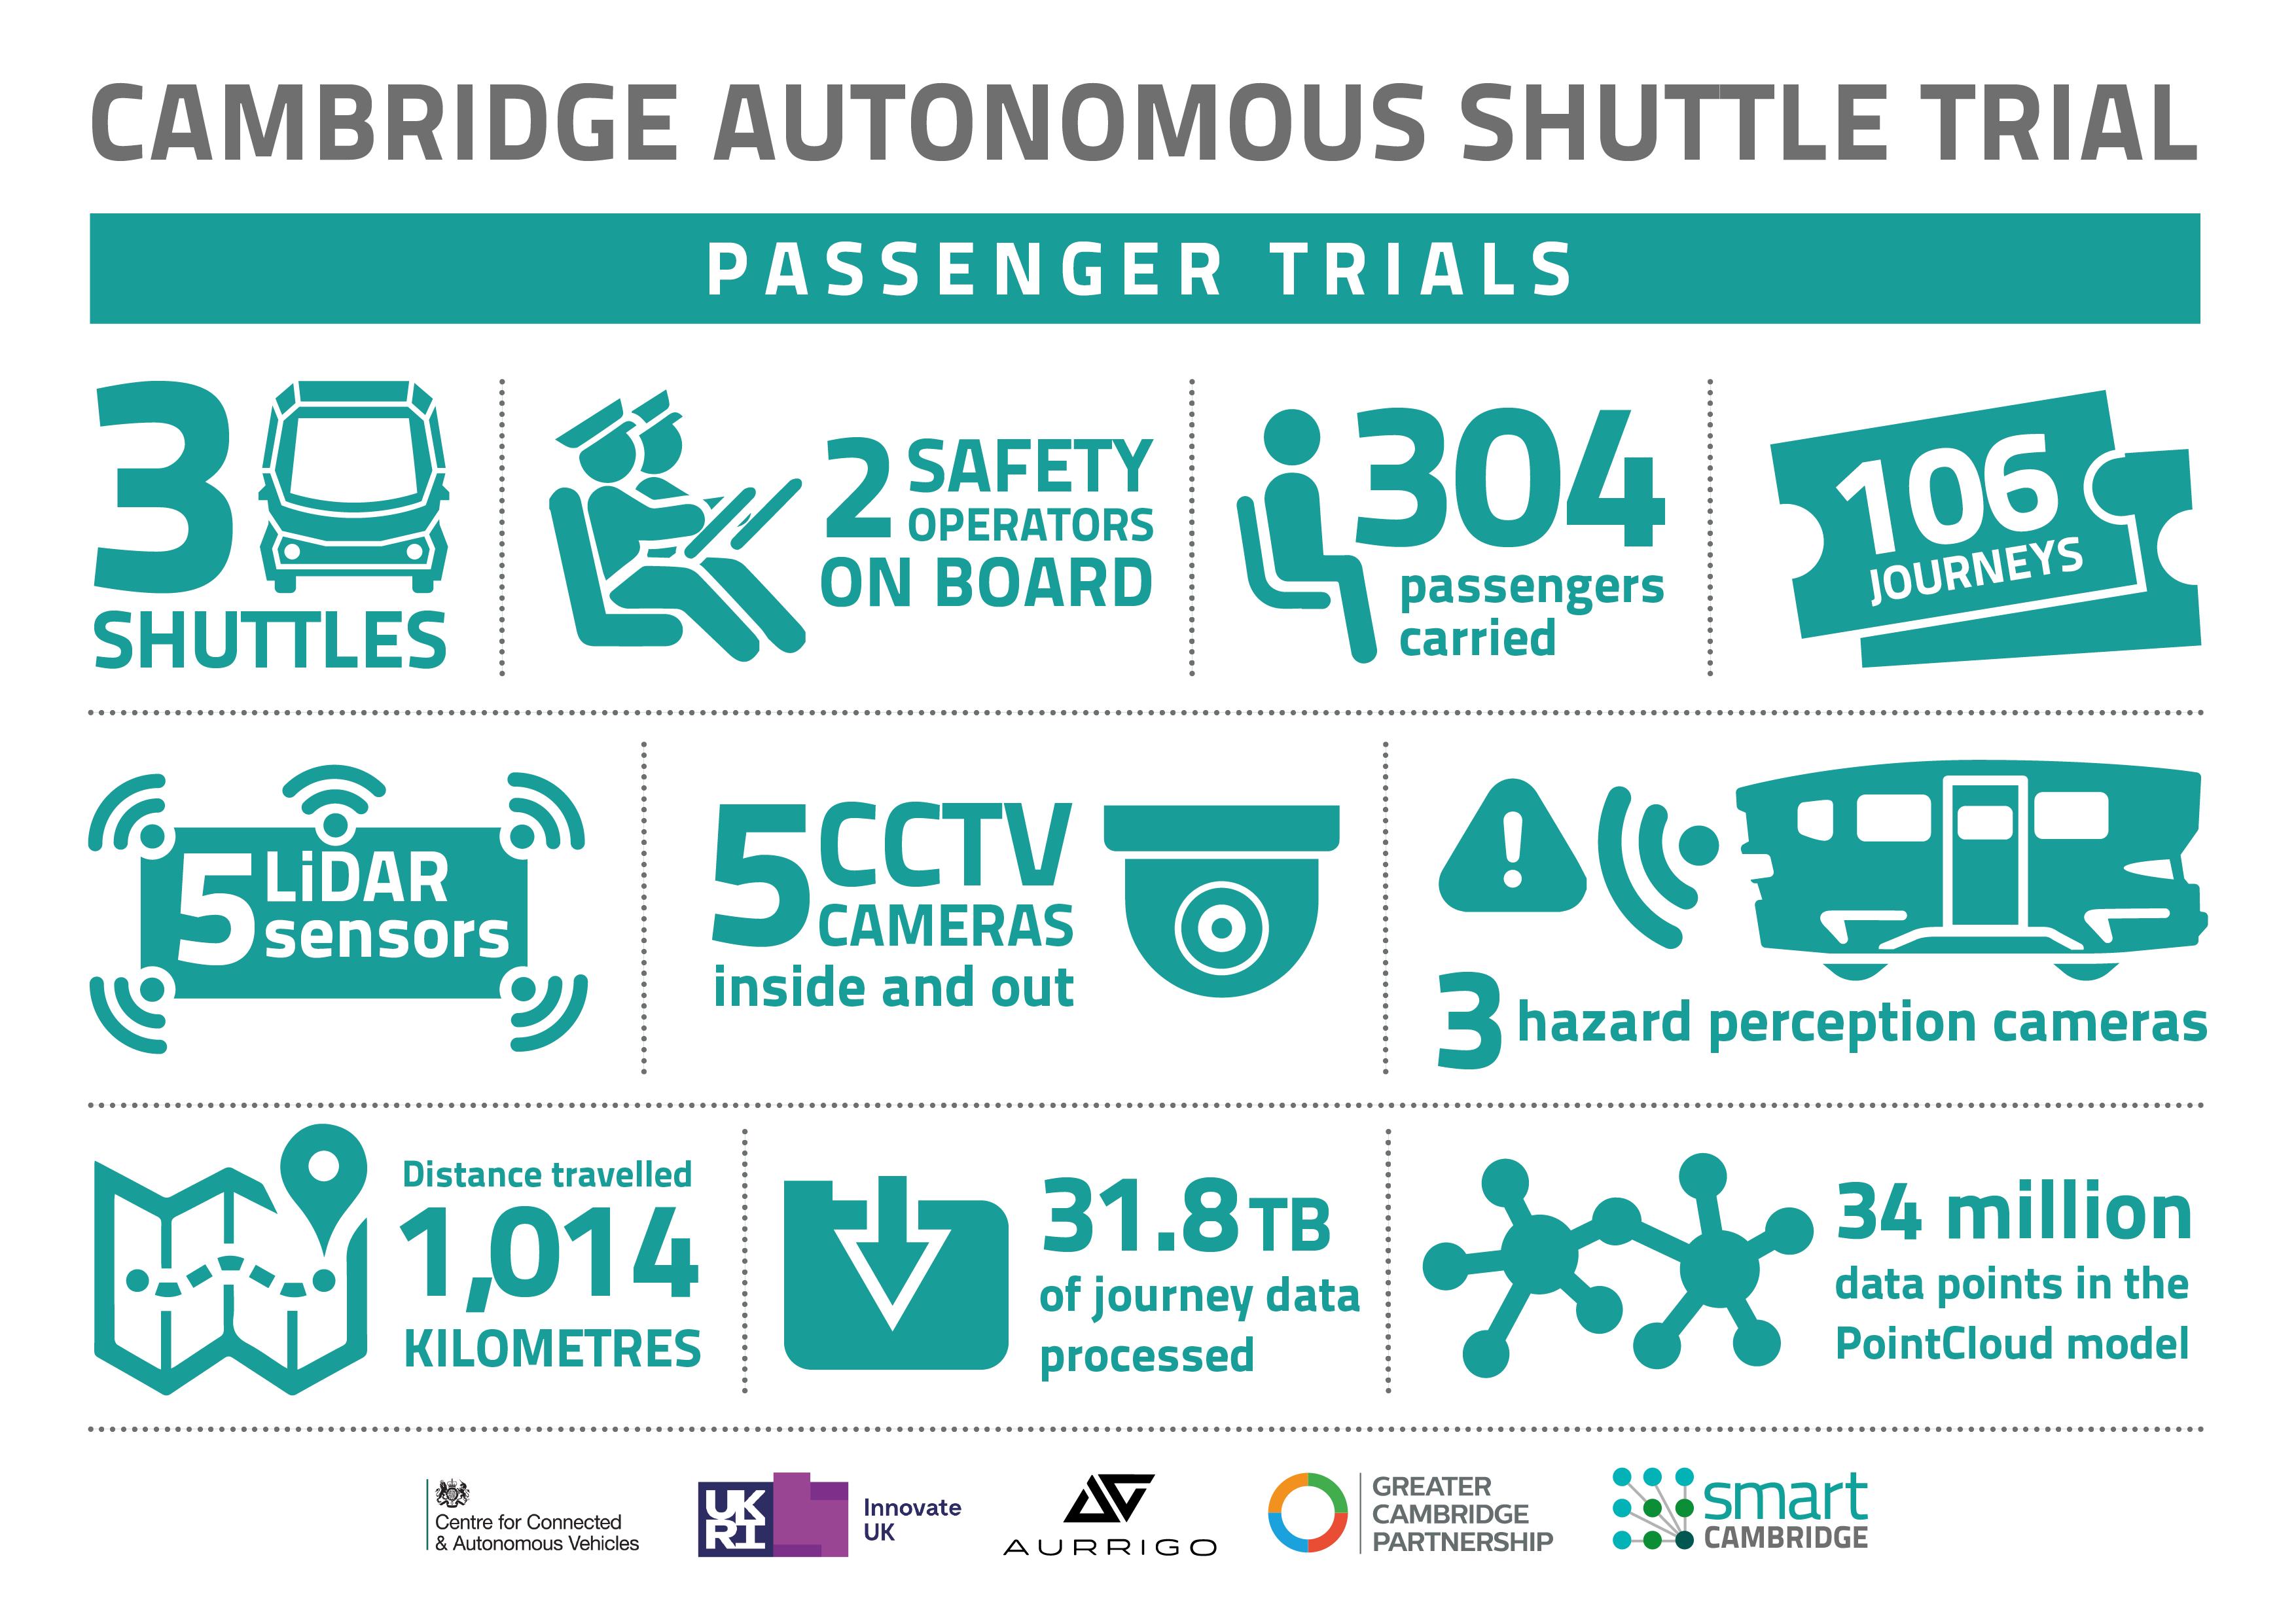 Hundreds take part in ground-breaking Cambridge autonomous shuttle passenger trial